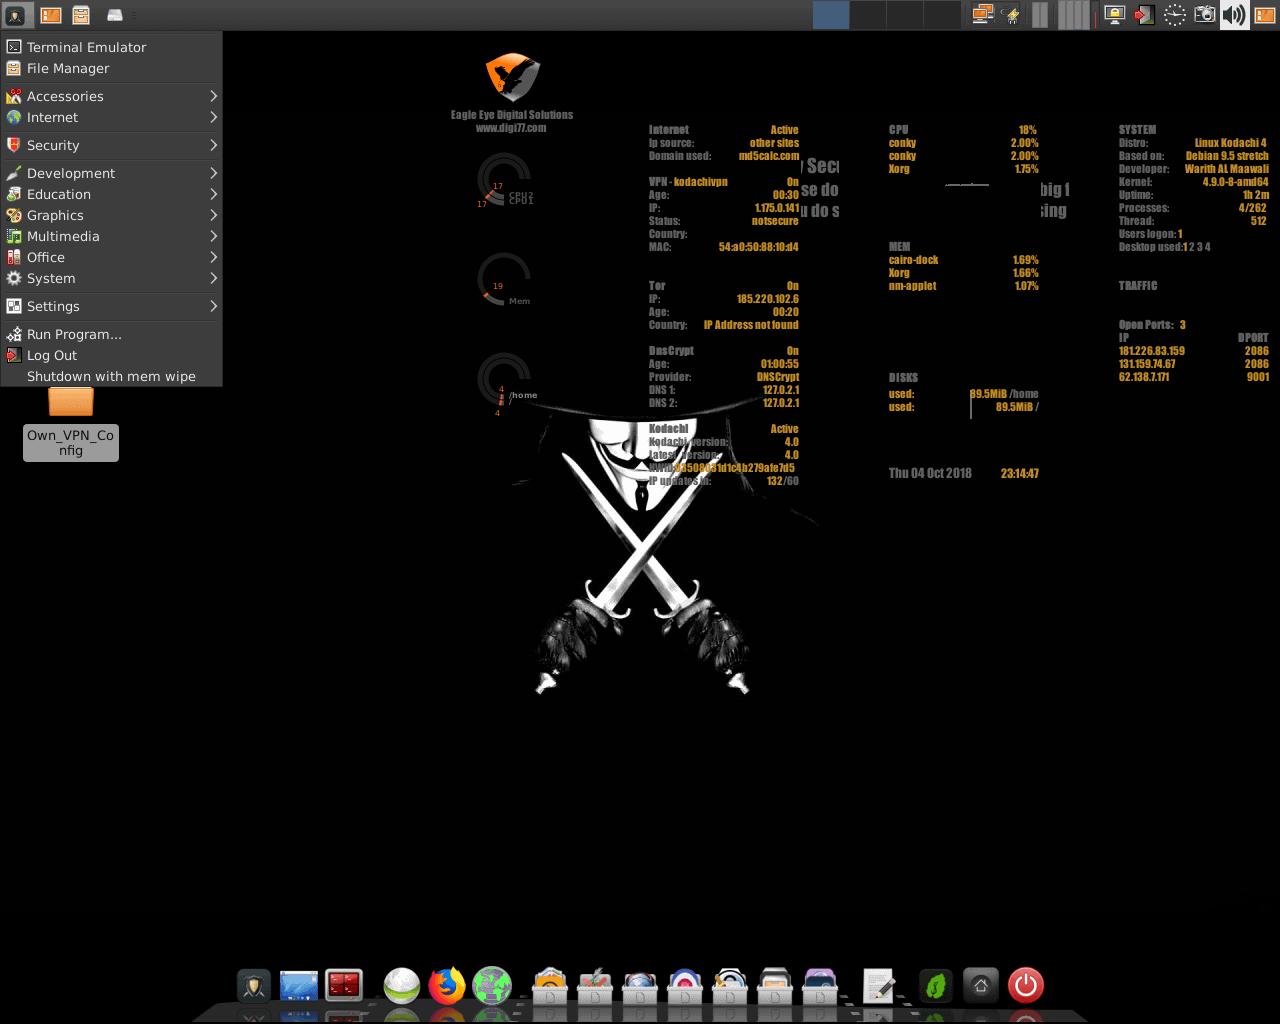 kodachi - Kodachi Linux 8.3 anti forensic ανώνυμο λειτουργικό